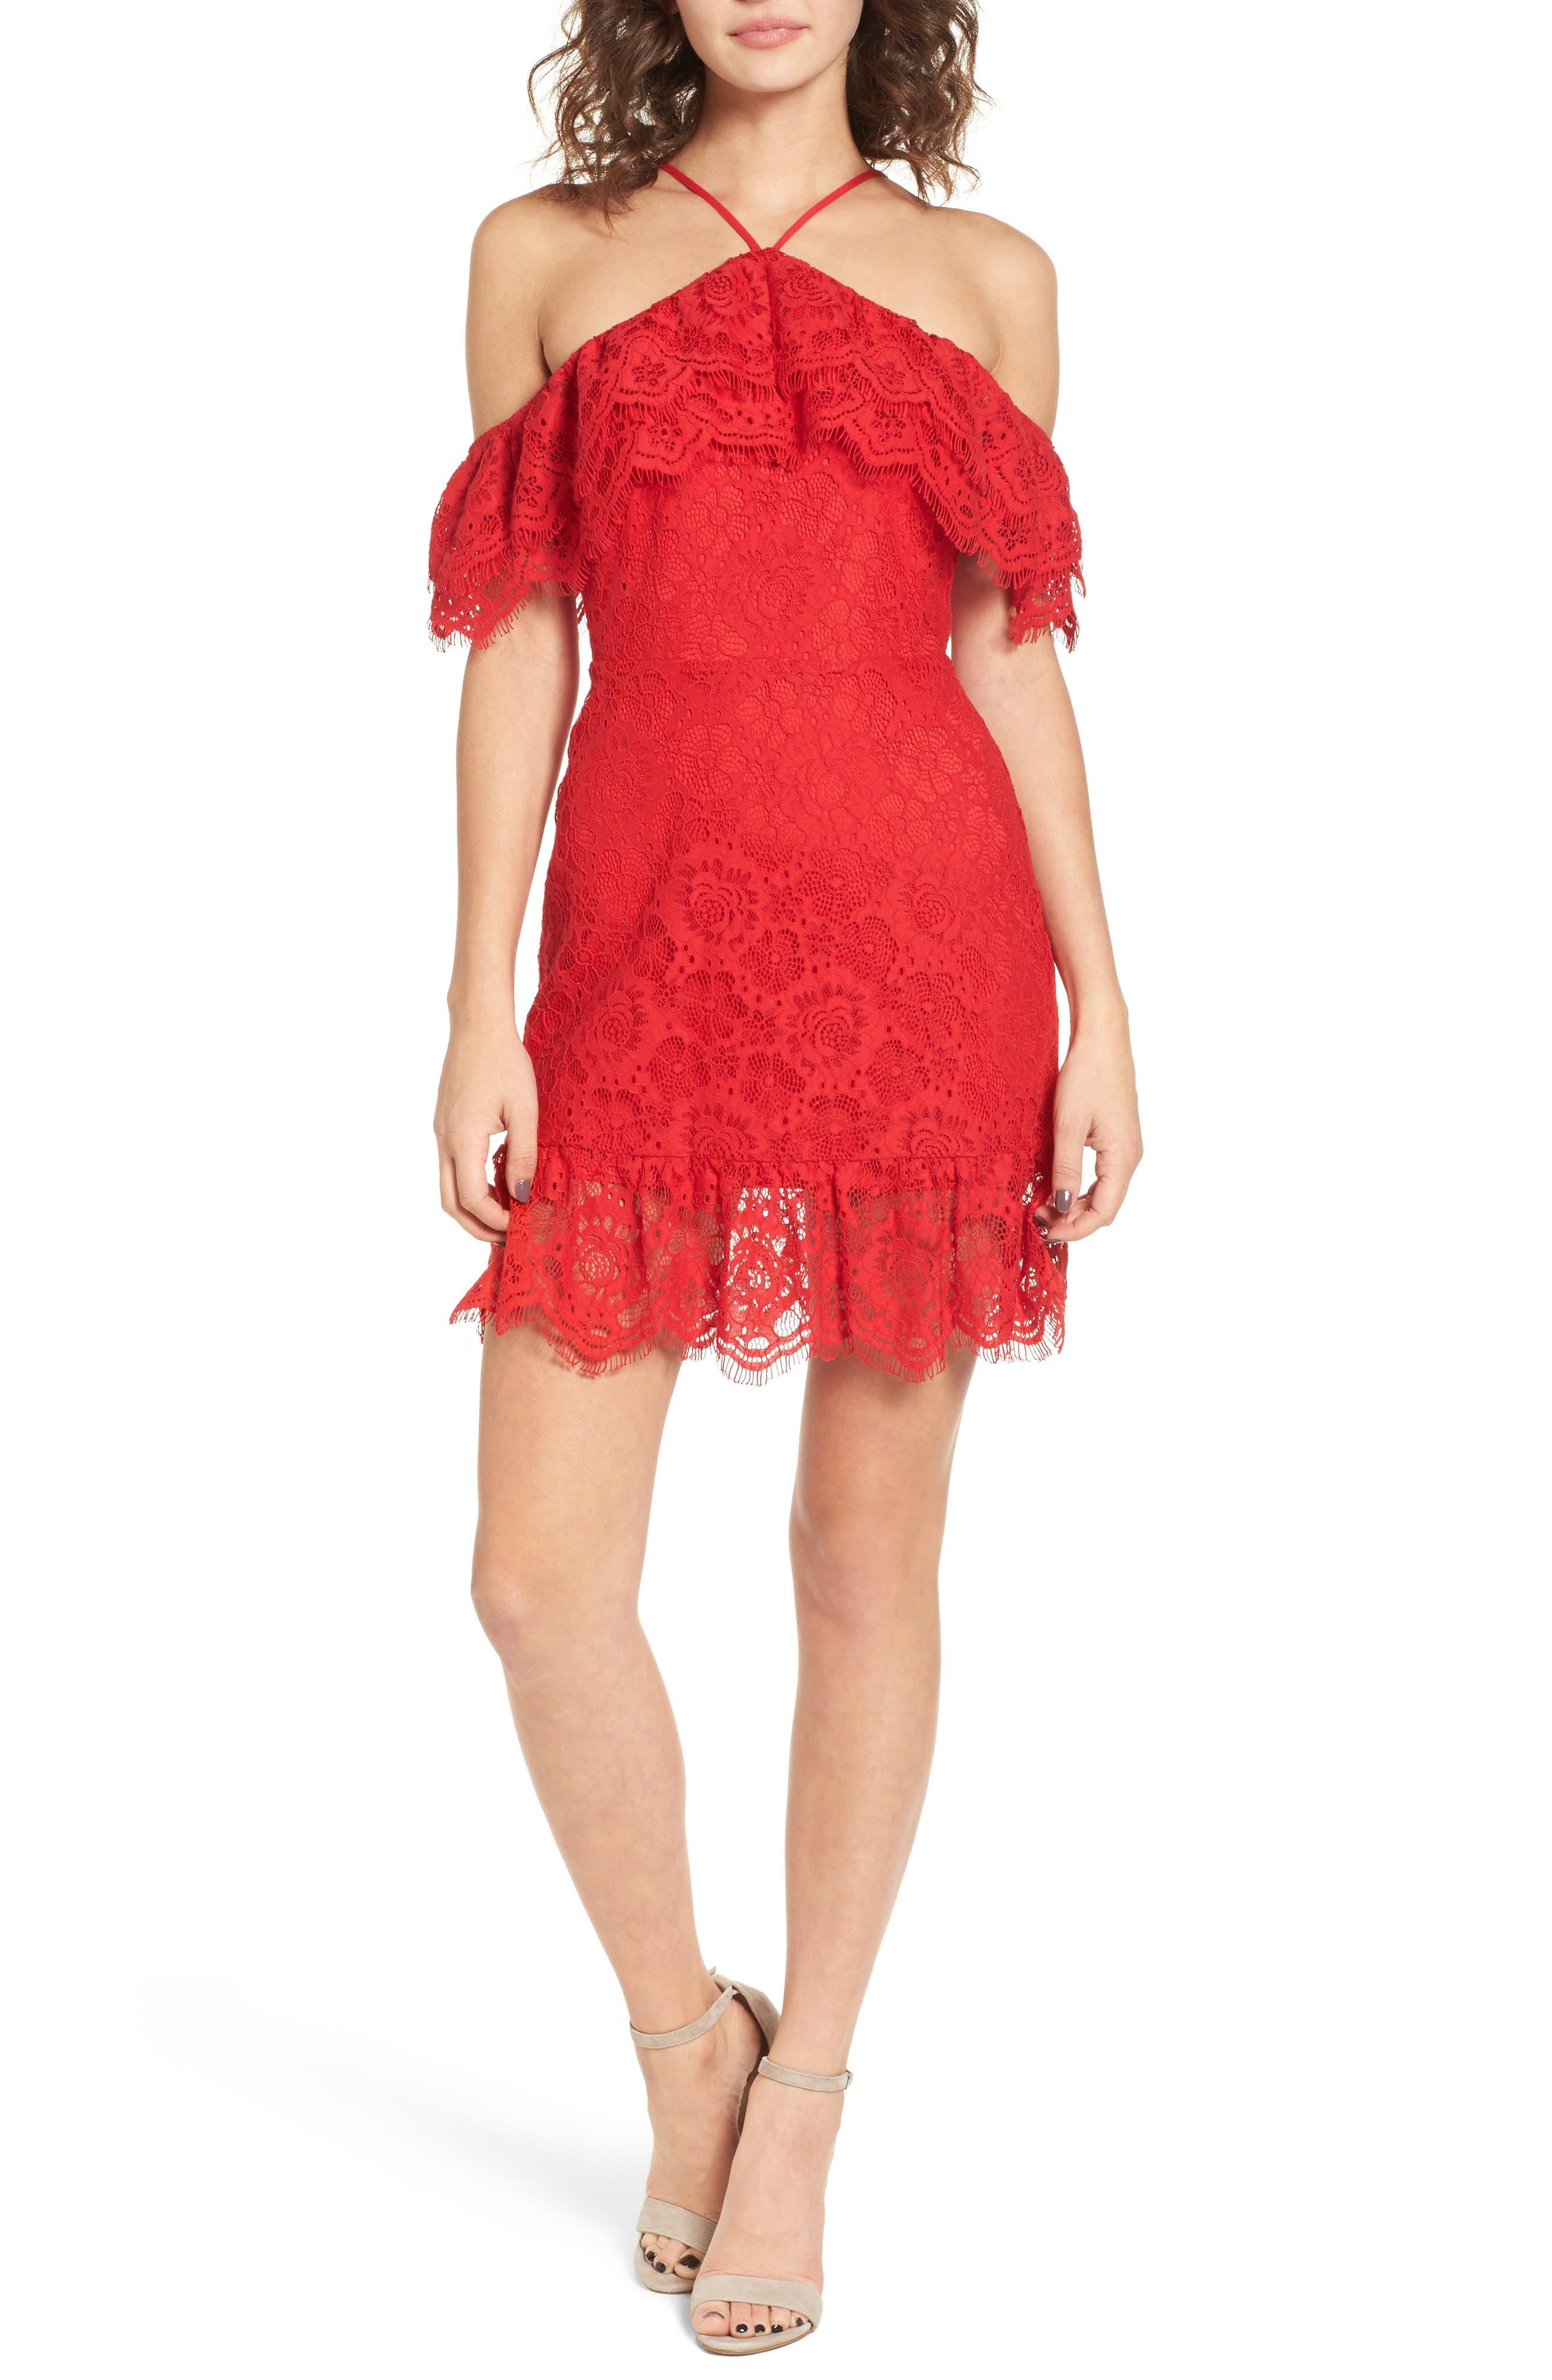 L'Amour Ruffle Halter Dress,                             Main thumbnail 1, color,                             600